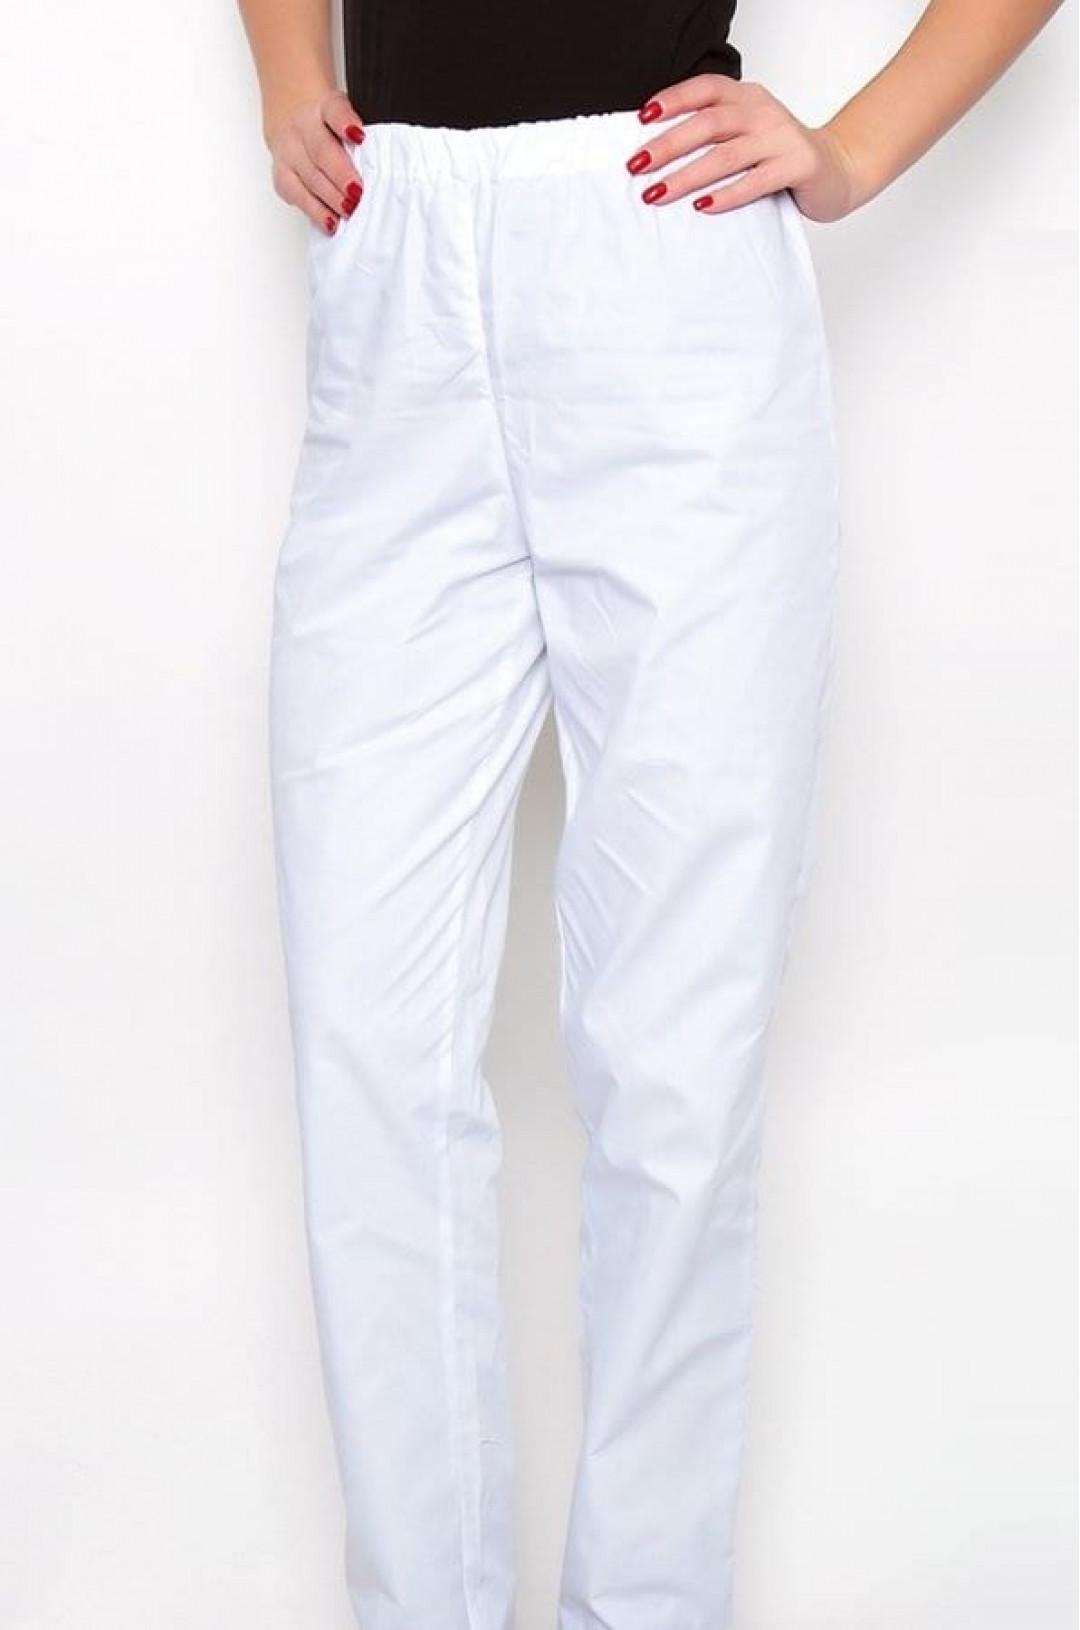 Брюки медицинские женские М-301 (белый, тиси)